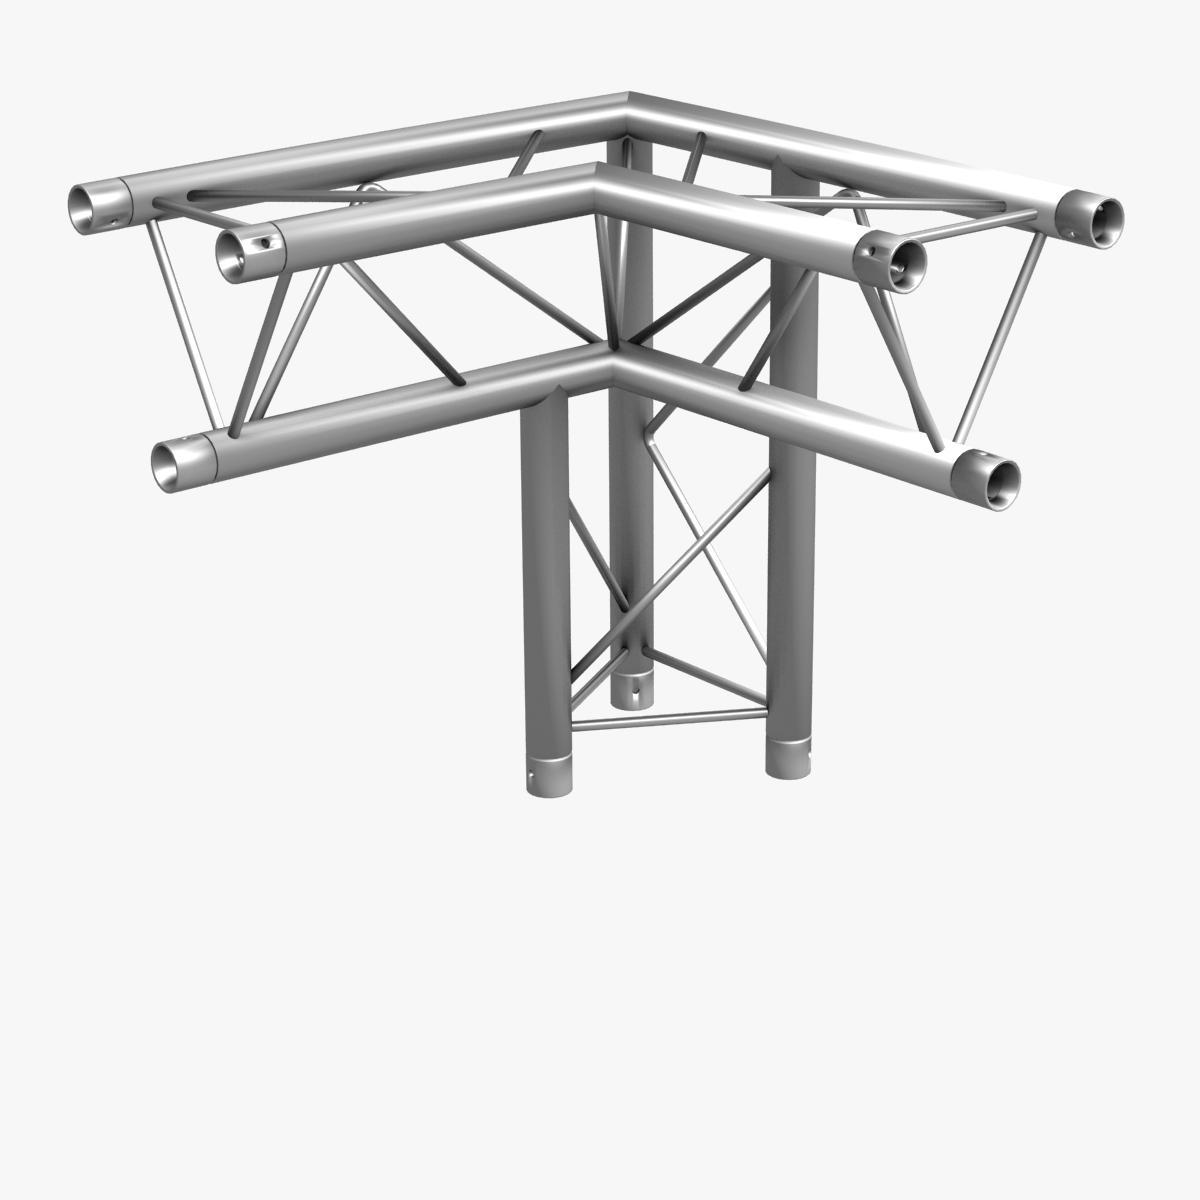 triangular trusses (collection 55 modular pieces) 3d model 3ds max dxf fbx c4d dae texture obj 216259